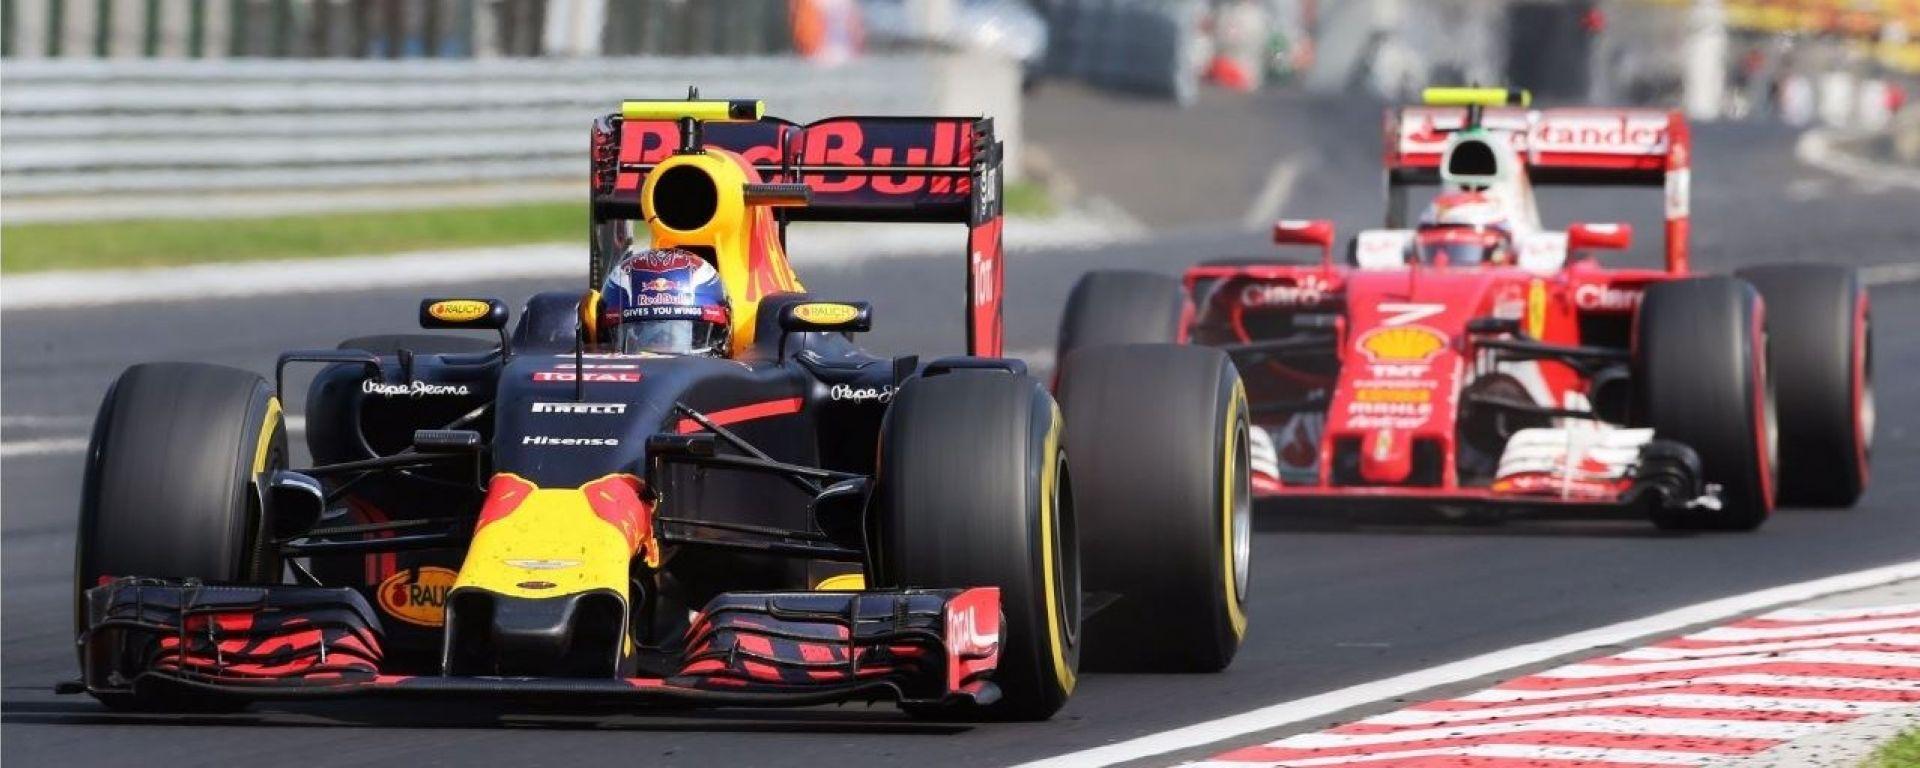 Hungaroring - Max Verstappen vs Kimi Raikkonen 2016